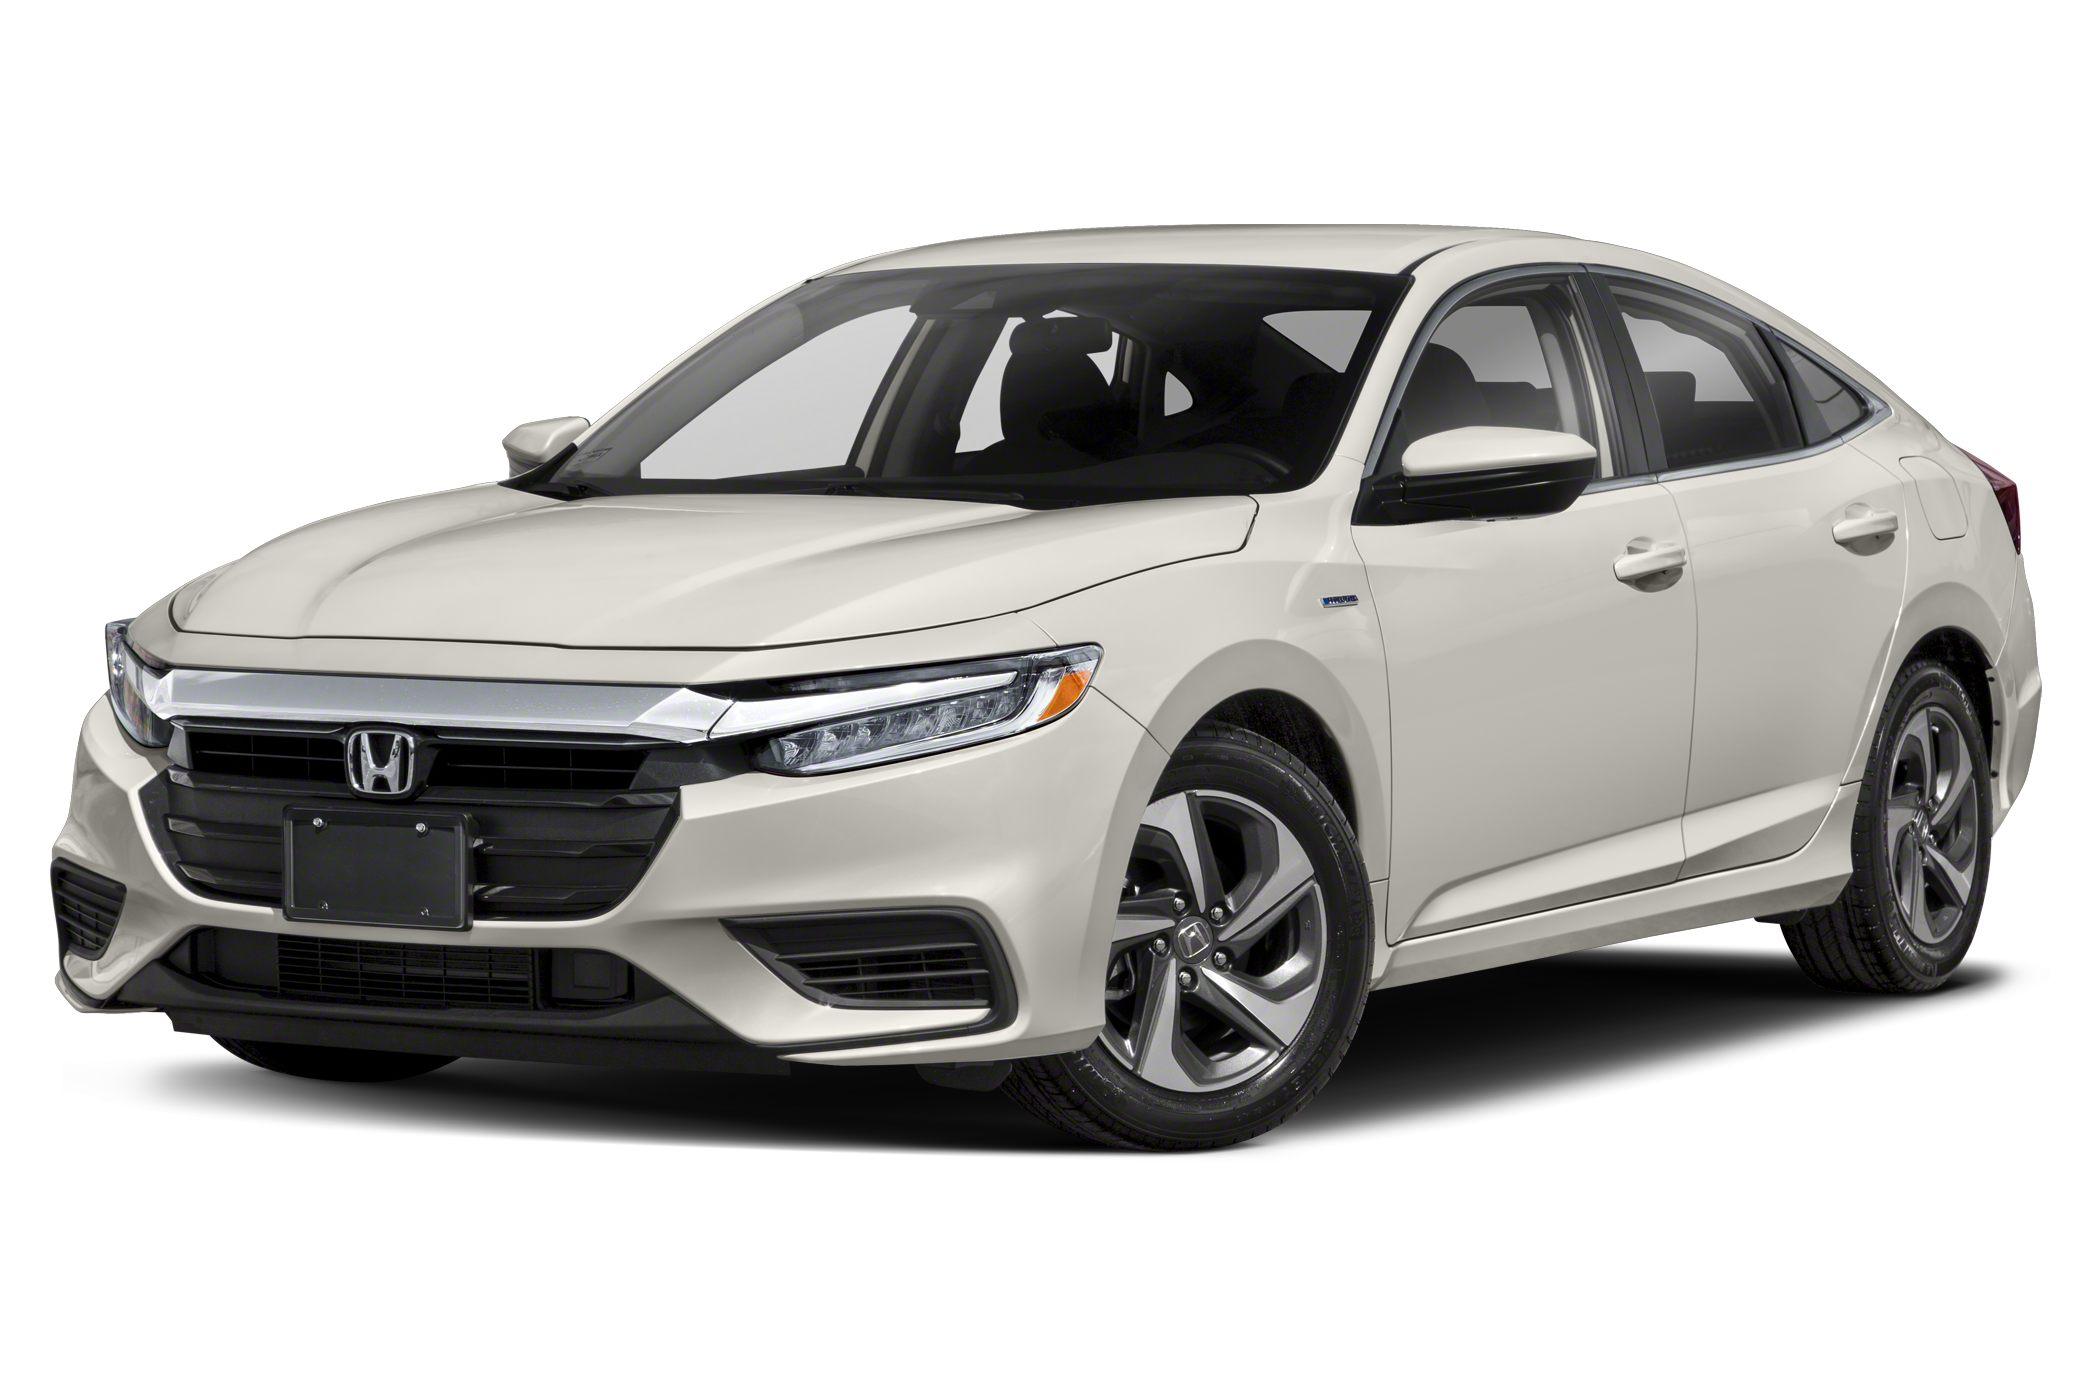 2019 Honda Insight details - Autoblog